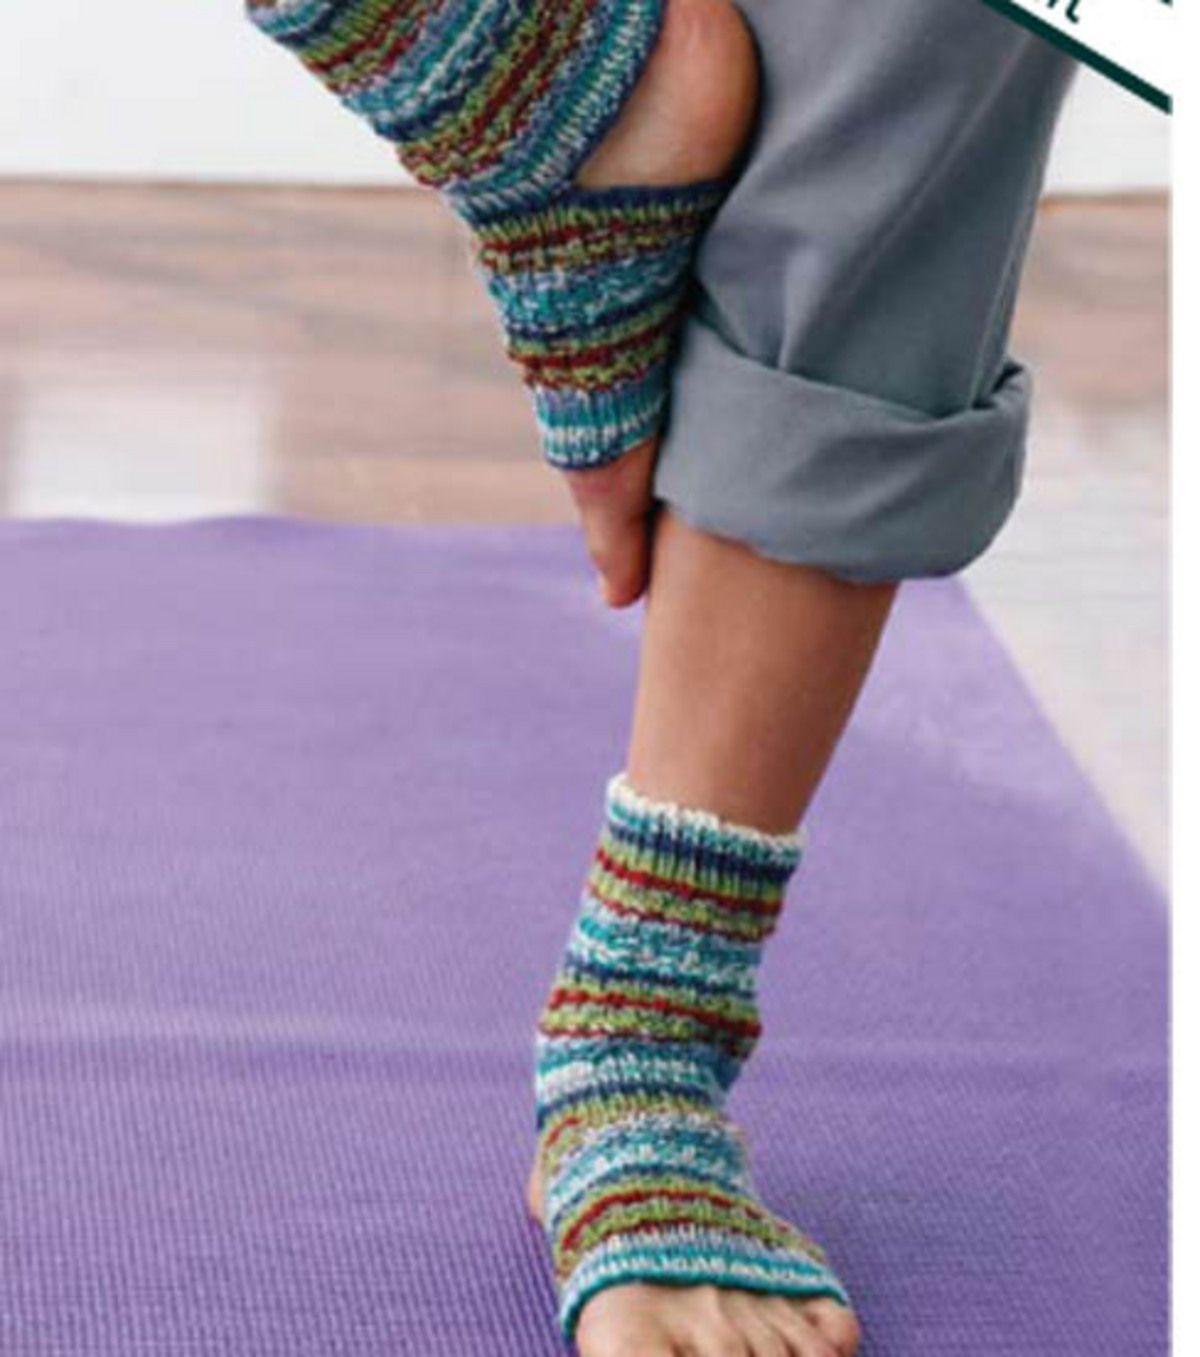 Yoga Socks | Crafting: Knitting Patterns | Pinterest | Socks ...